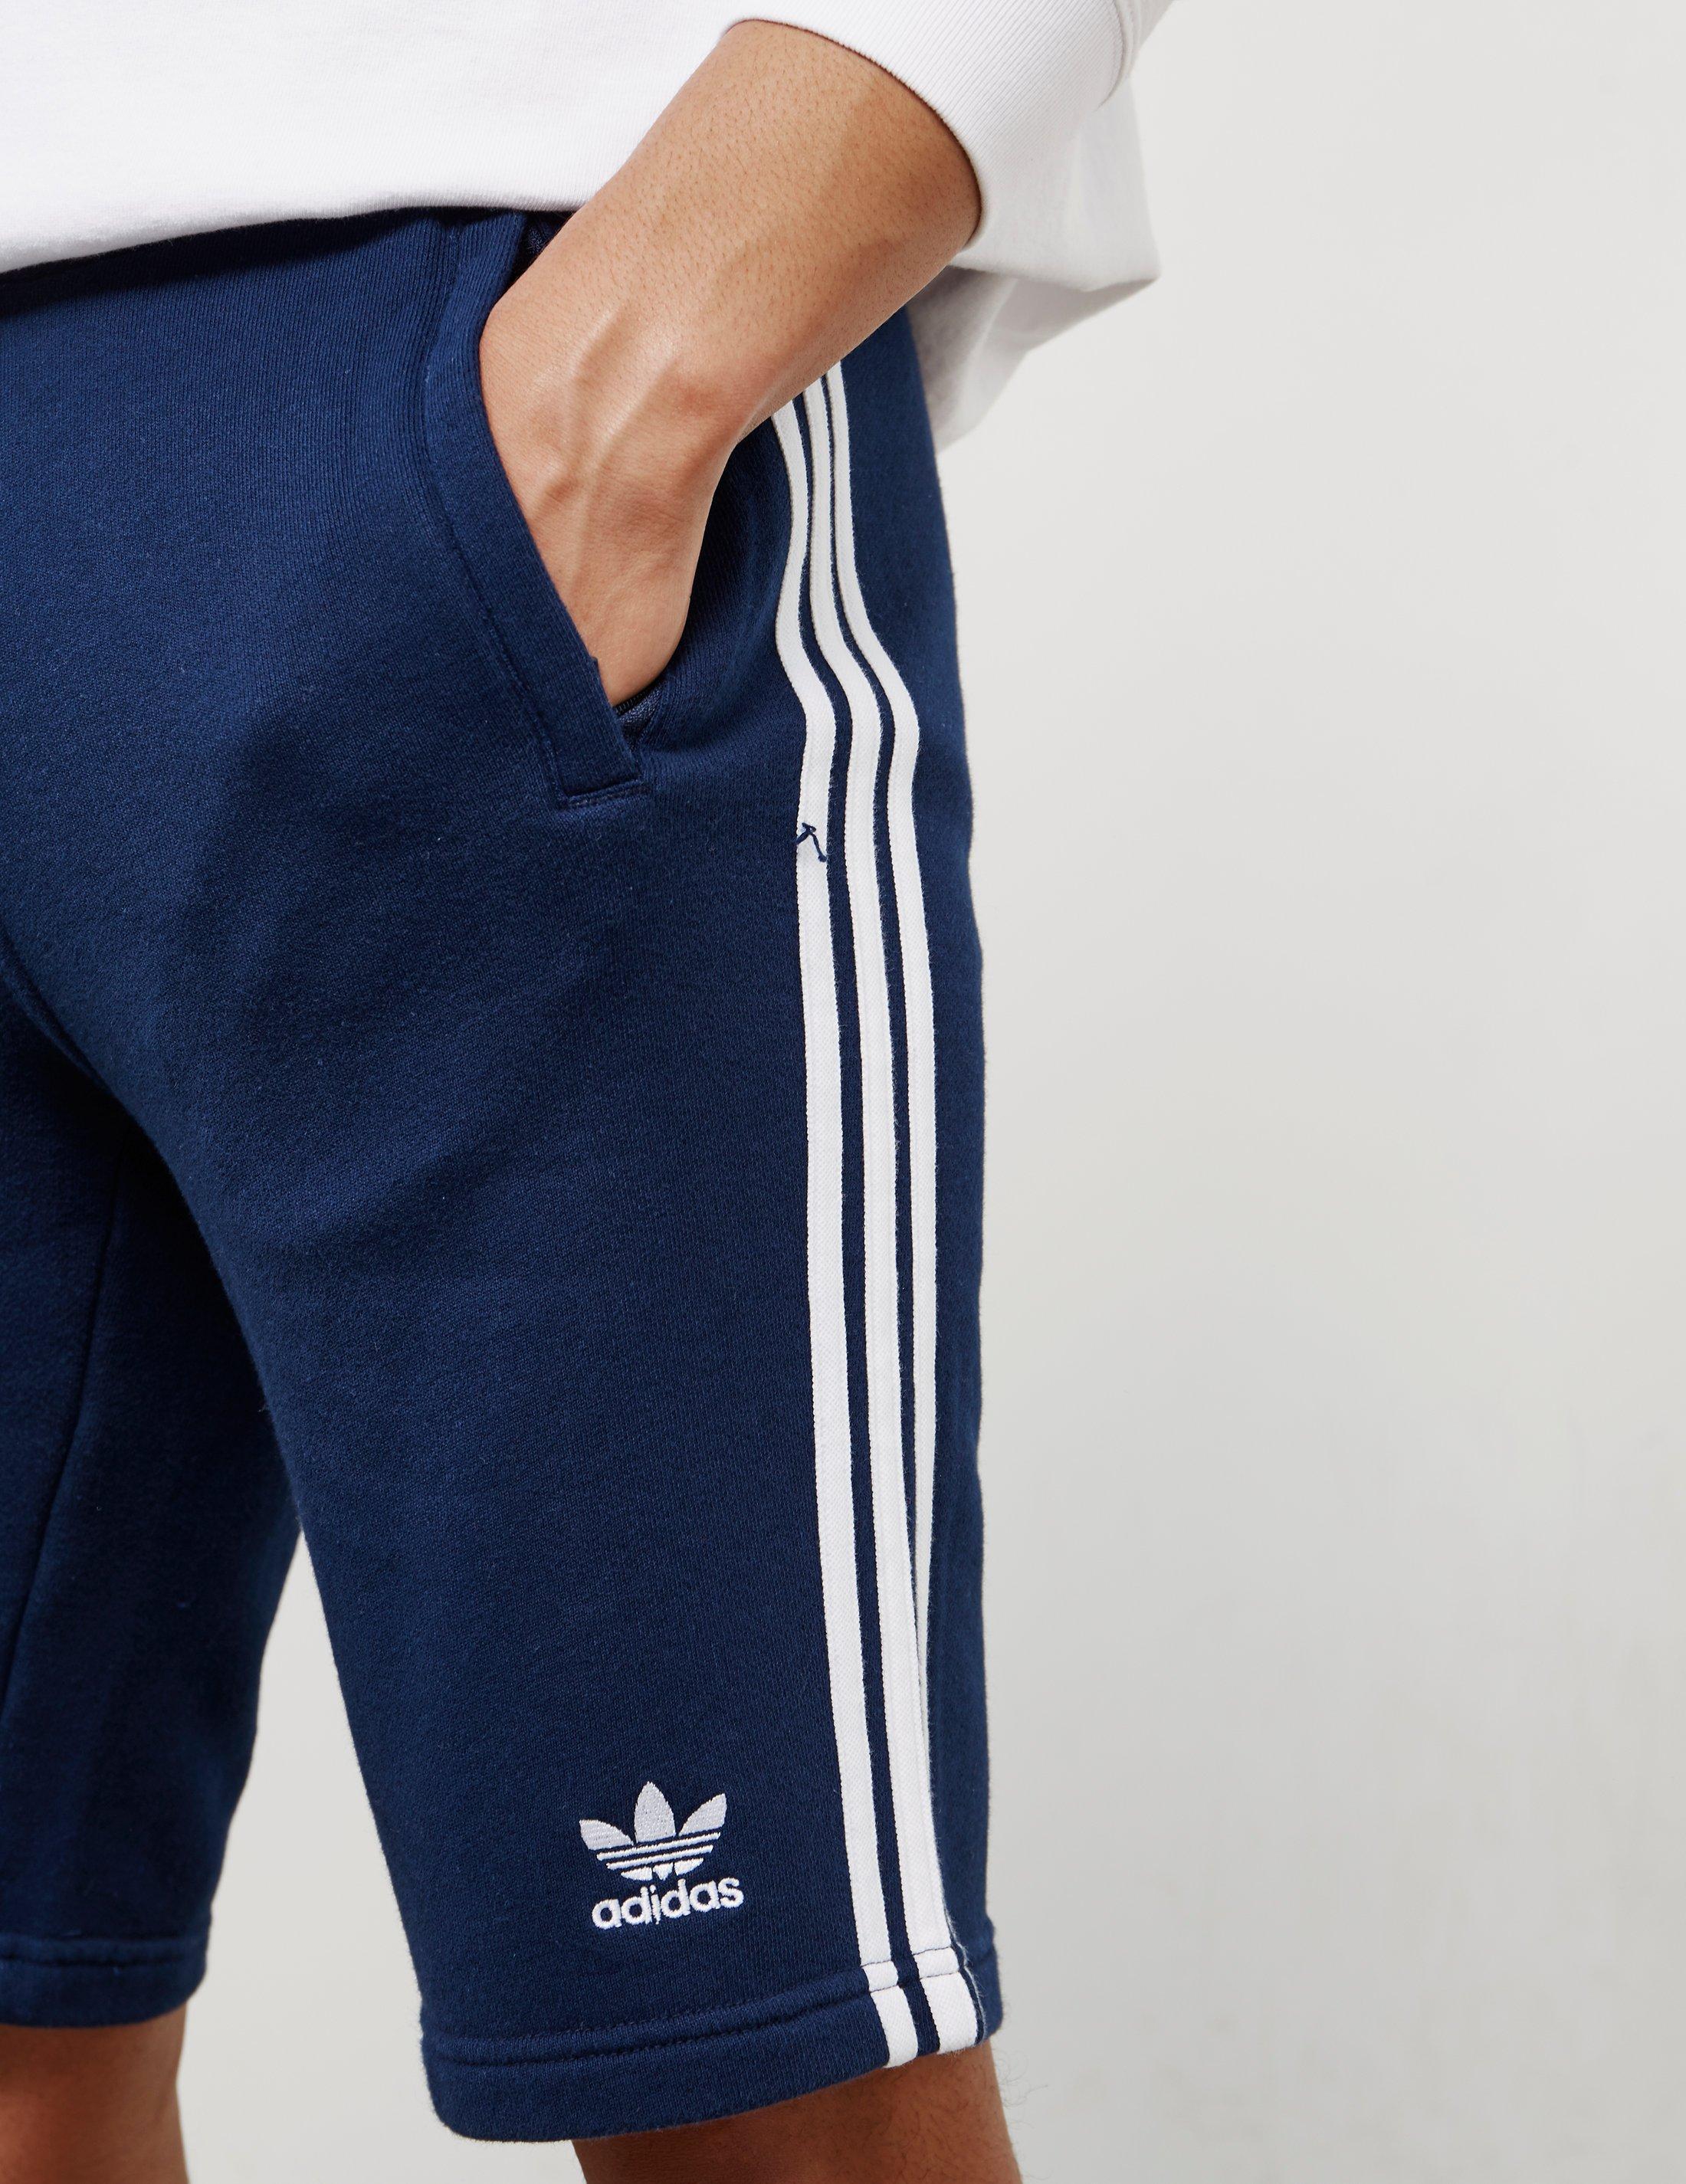 Mens 3 stripes Fleece Shorts Navy Blue